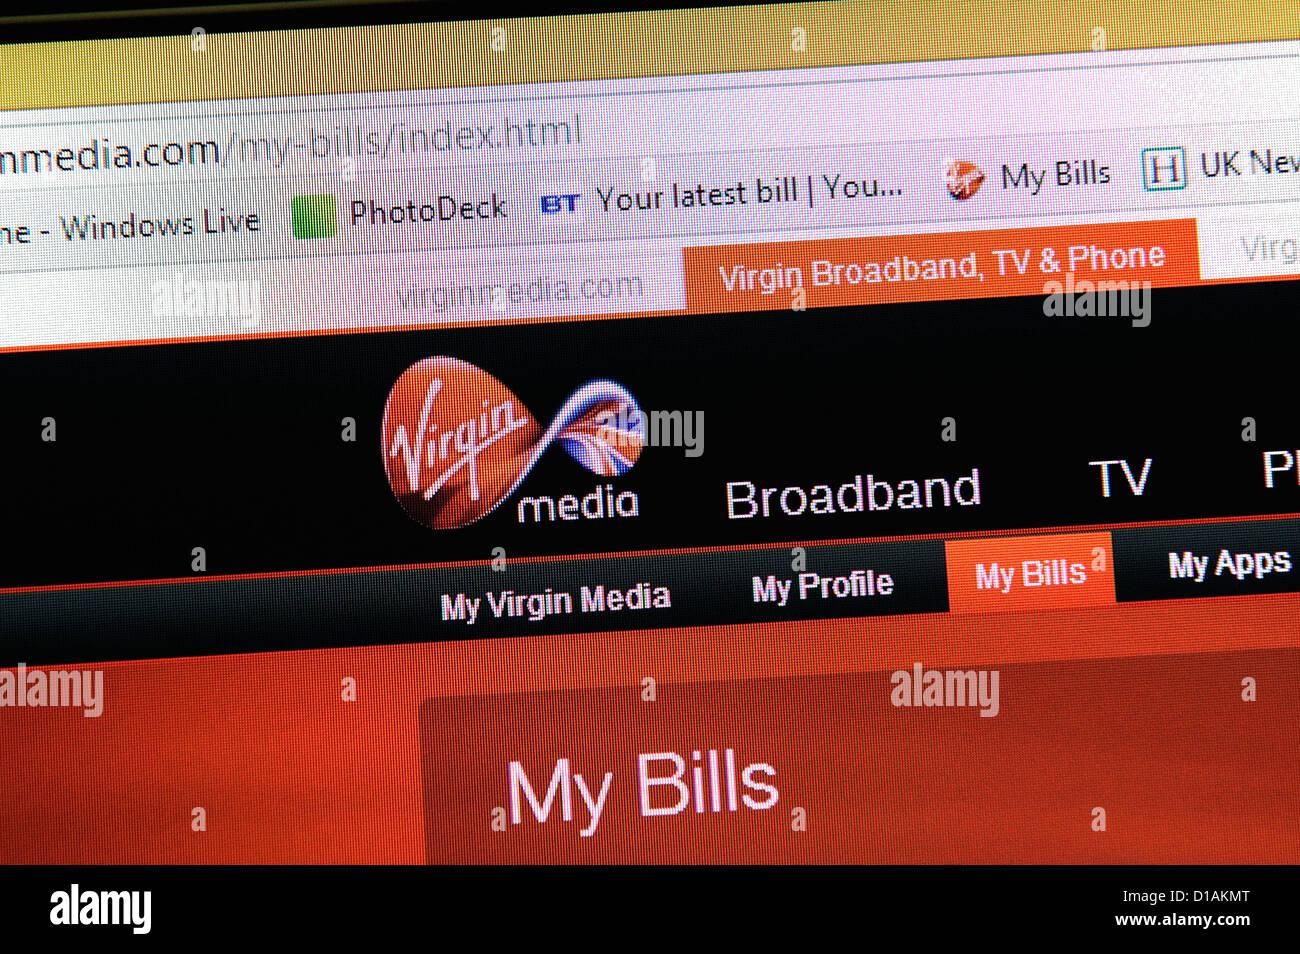 Virgin media phone bills agree, remarkable